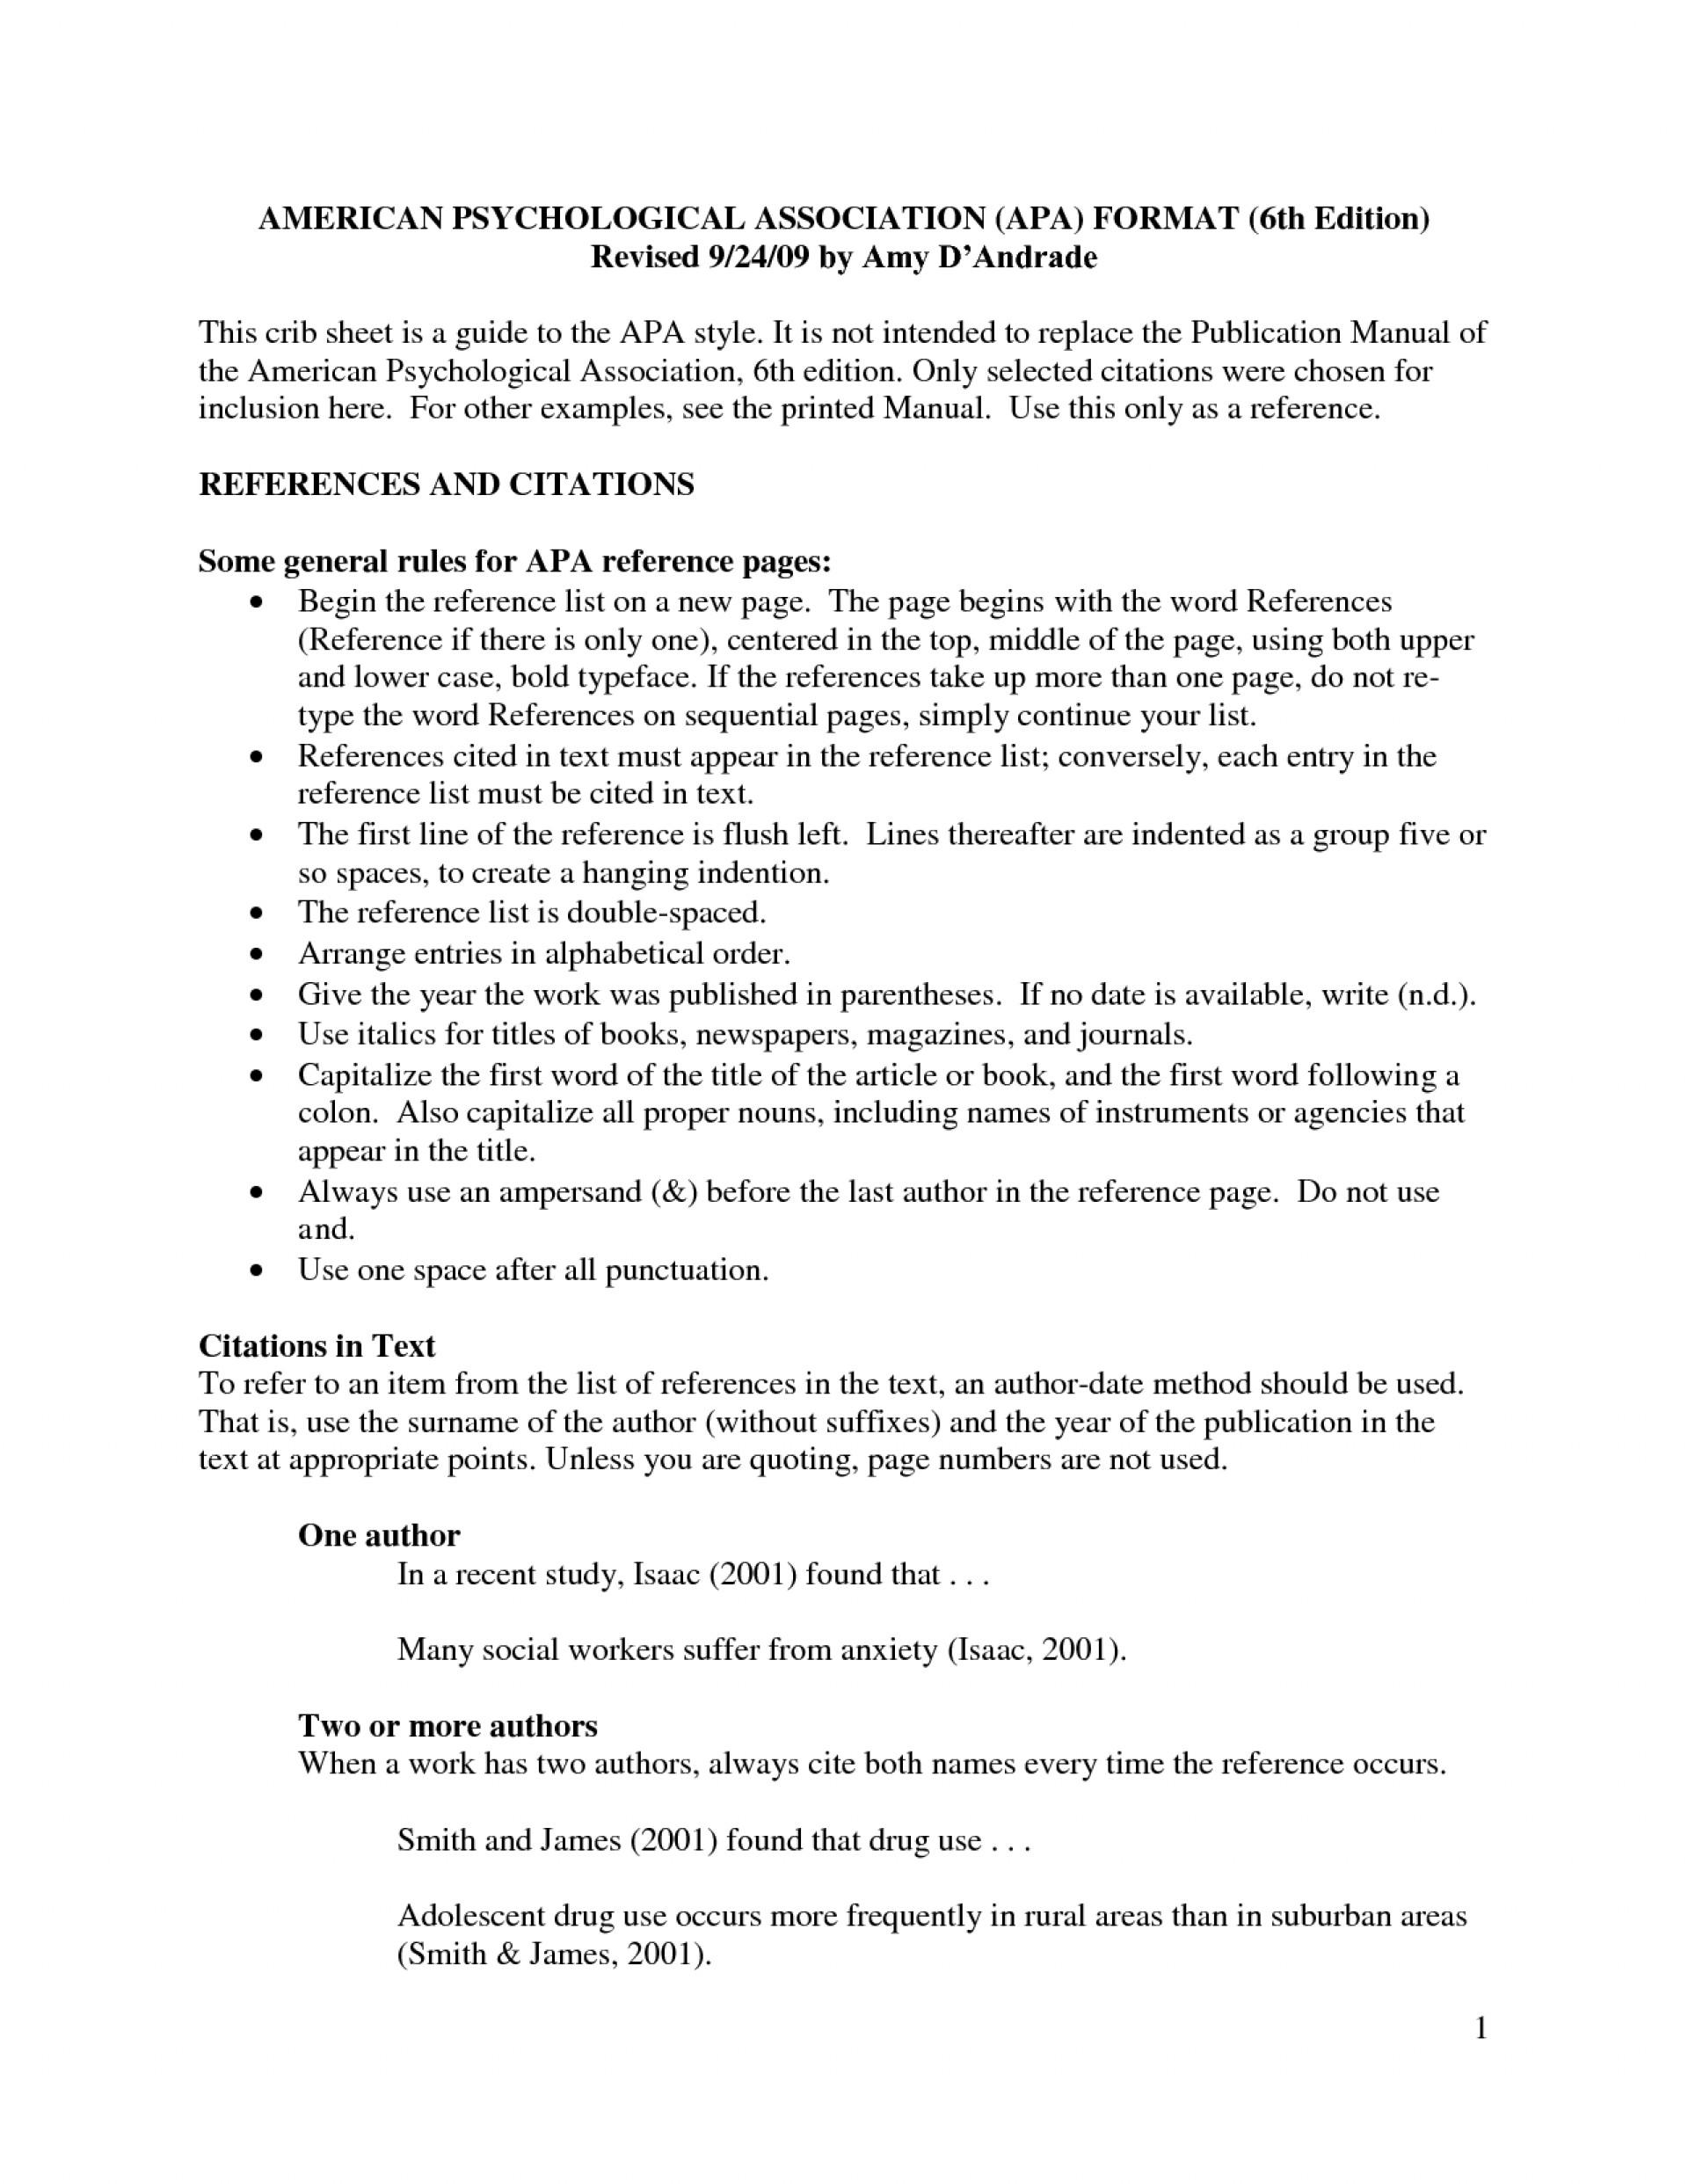 Uwe dissertation binding